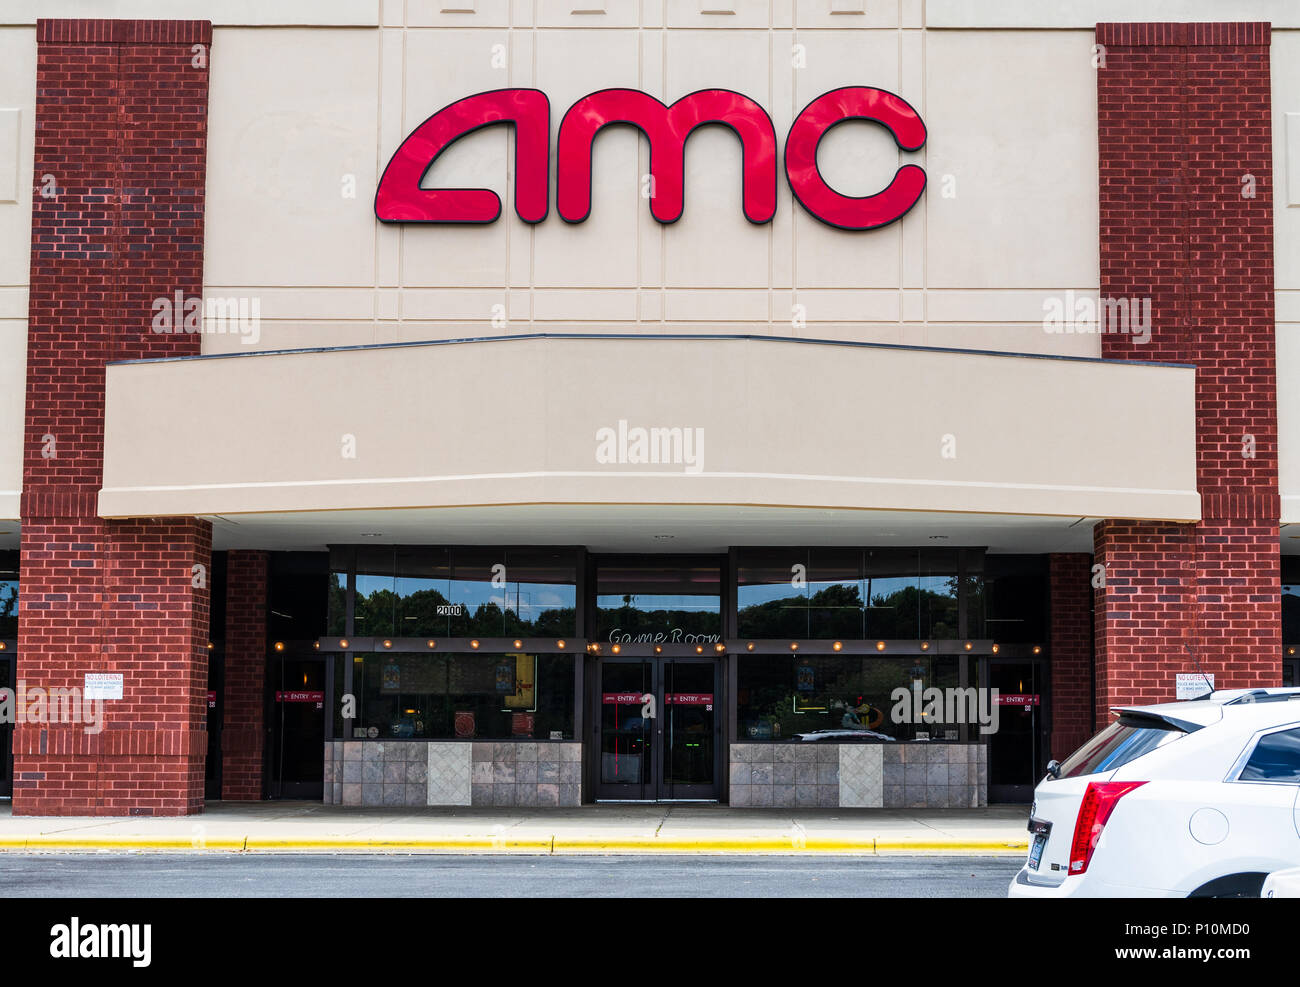 Carmike Hickory Nc >> Amc Theatre Movies Cinema Stock Photos Amc Theatre Movies Cinema